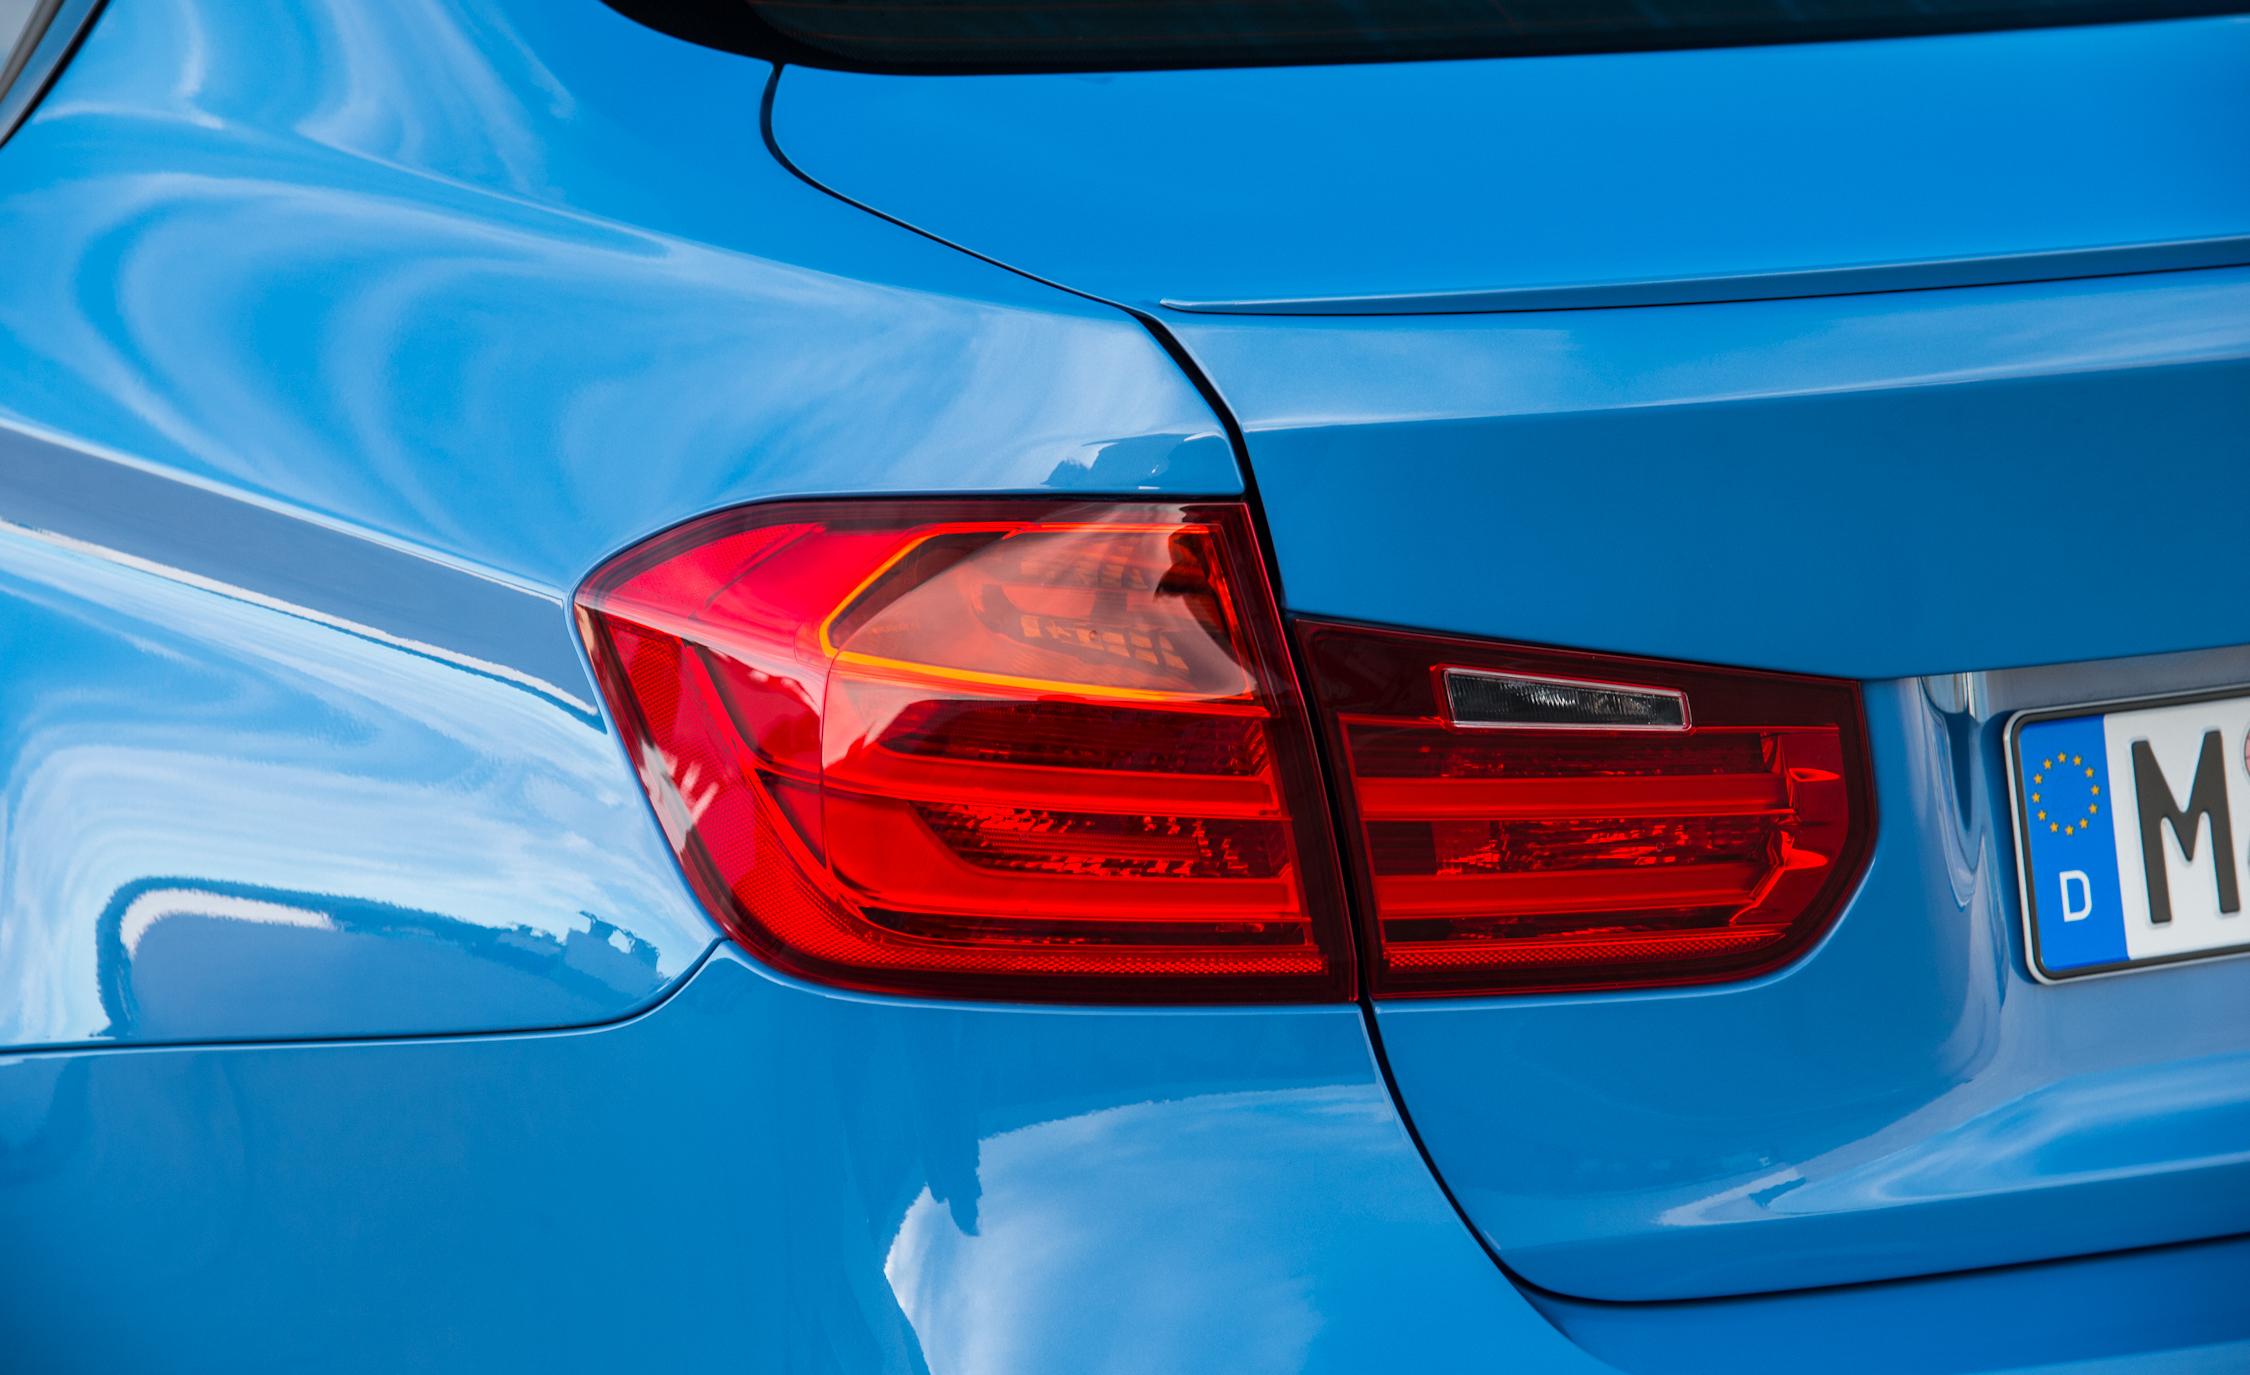 2015 BMW M3 Sedan Taillight